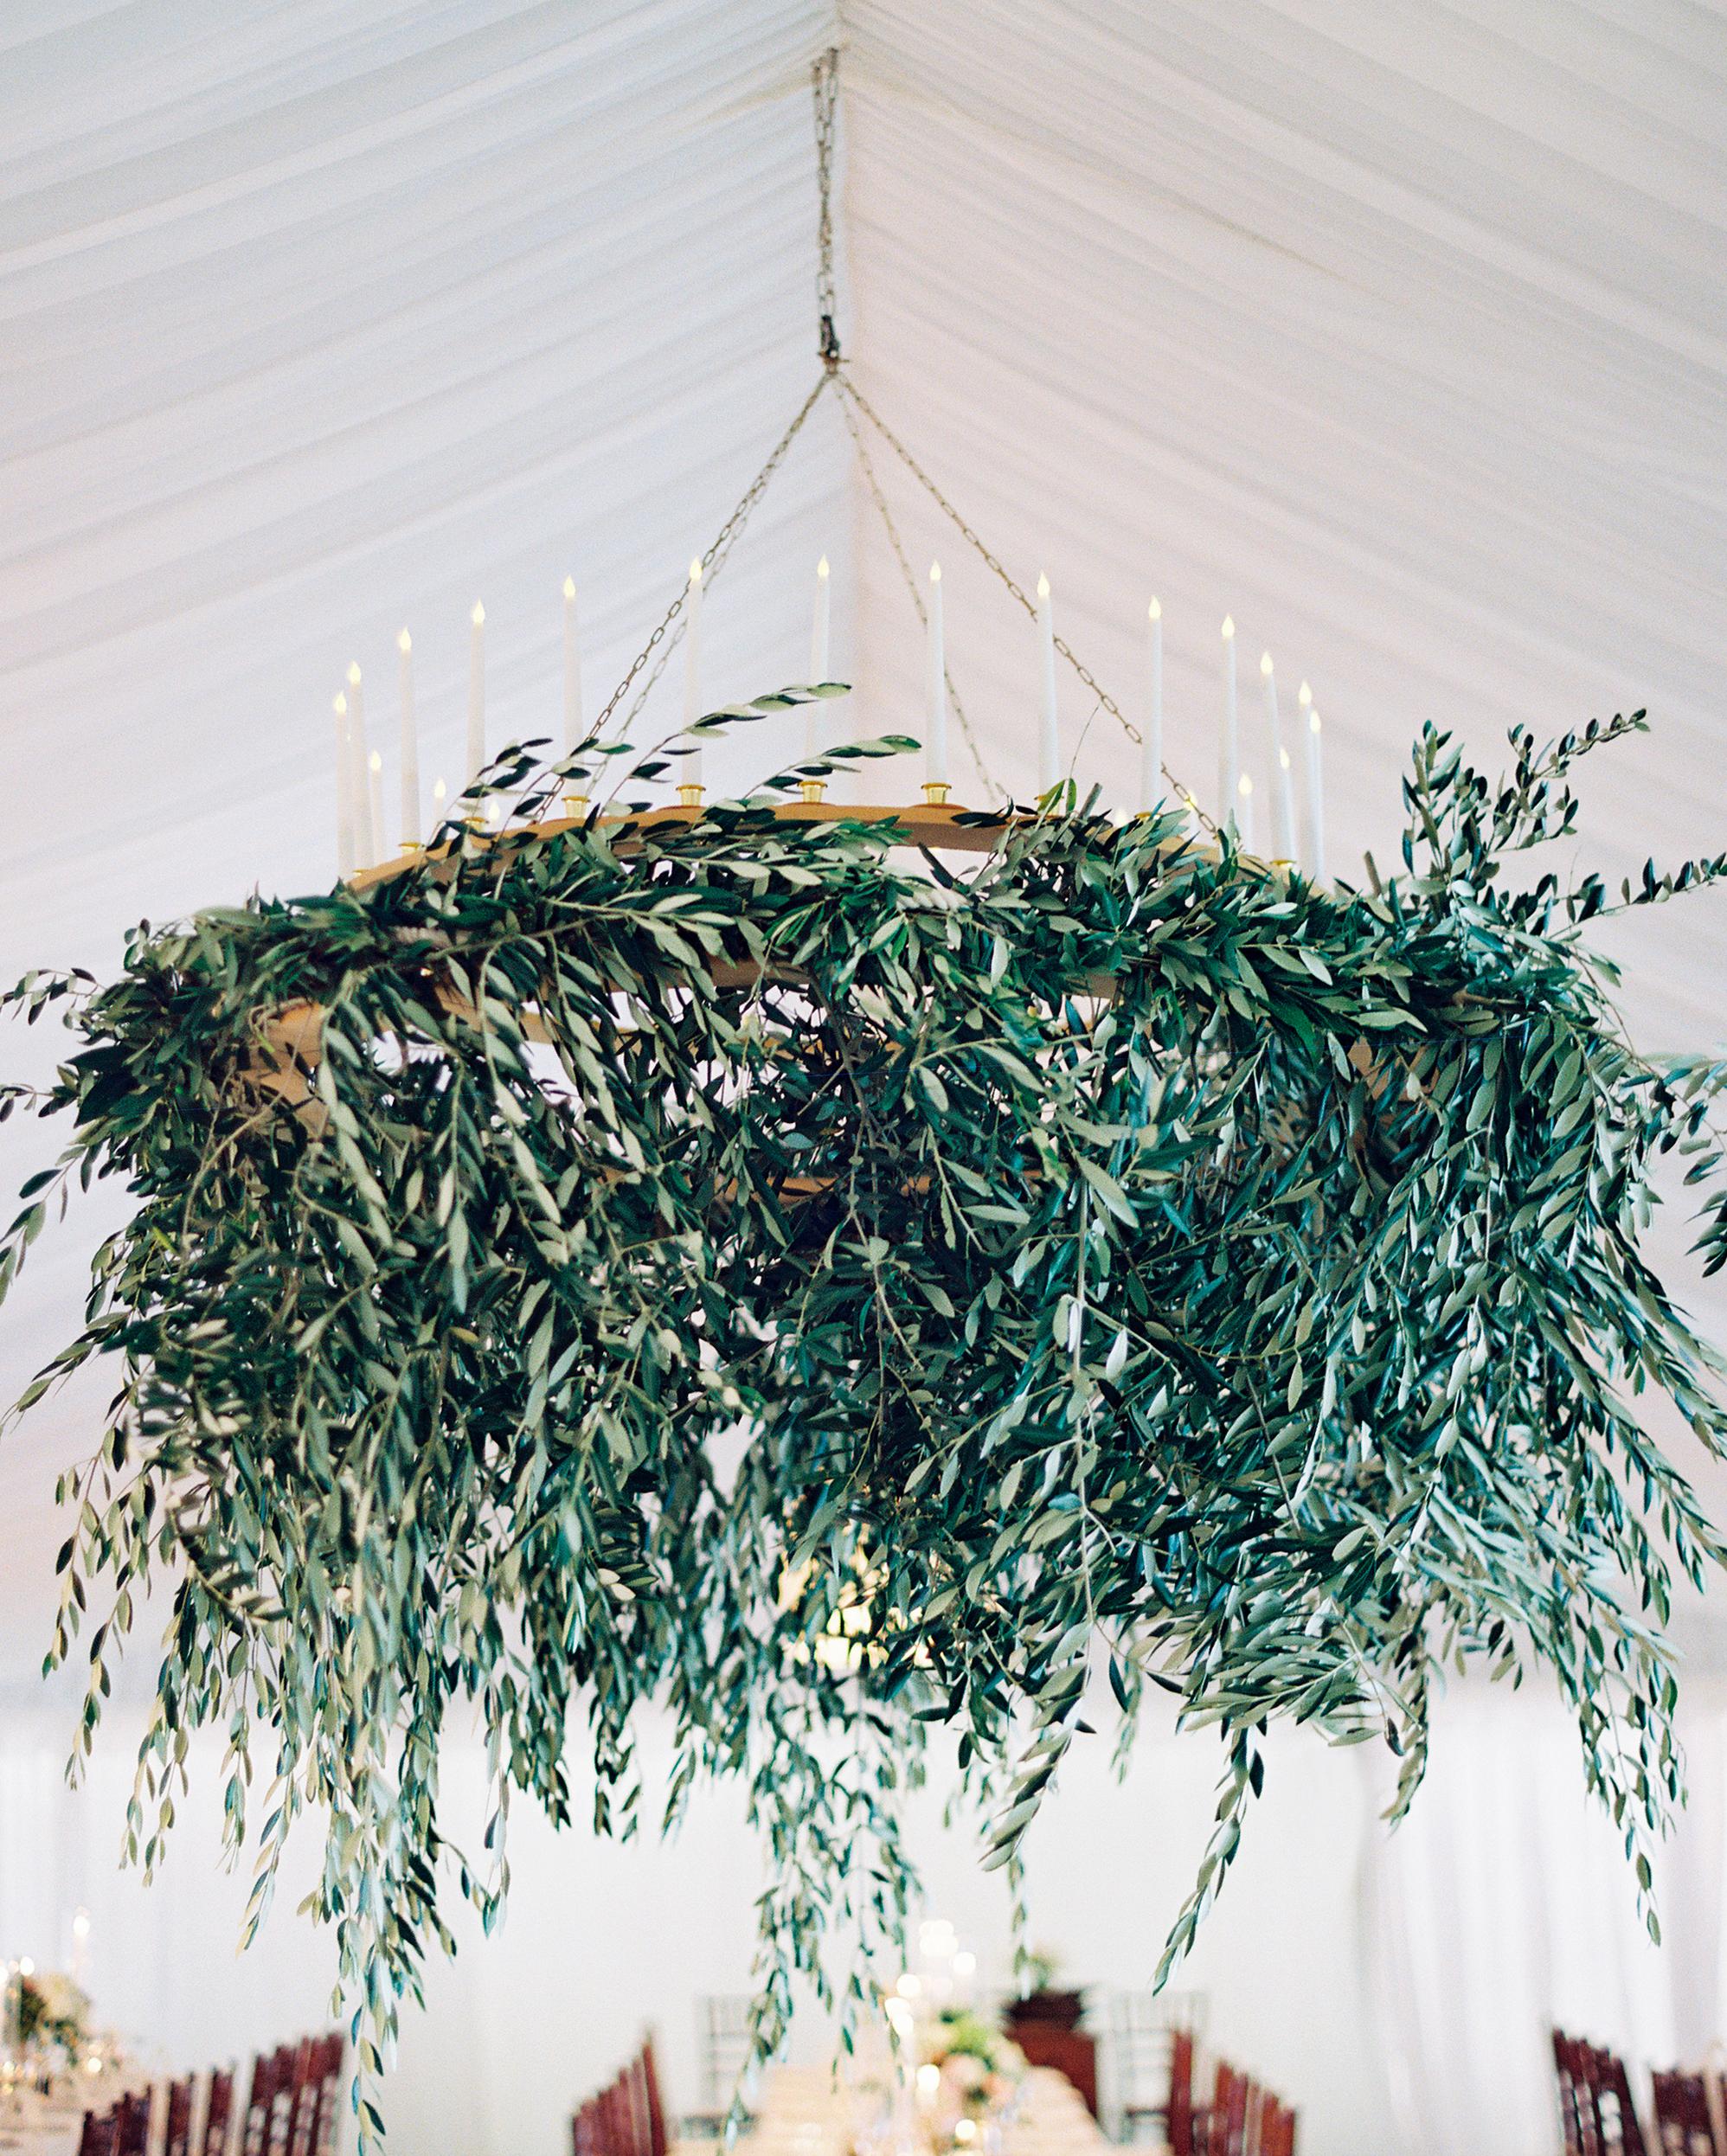 jemma-michael-wedding-chandelier-002659011-s112110-0815.jpg